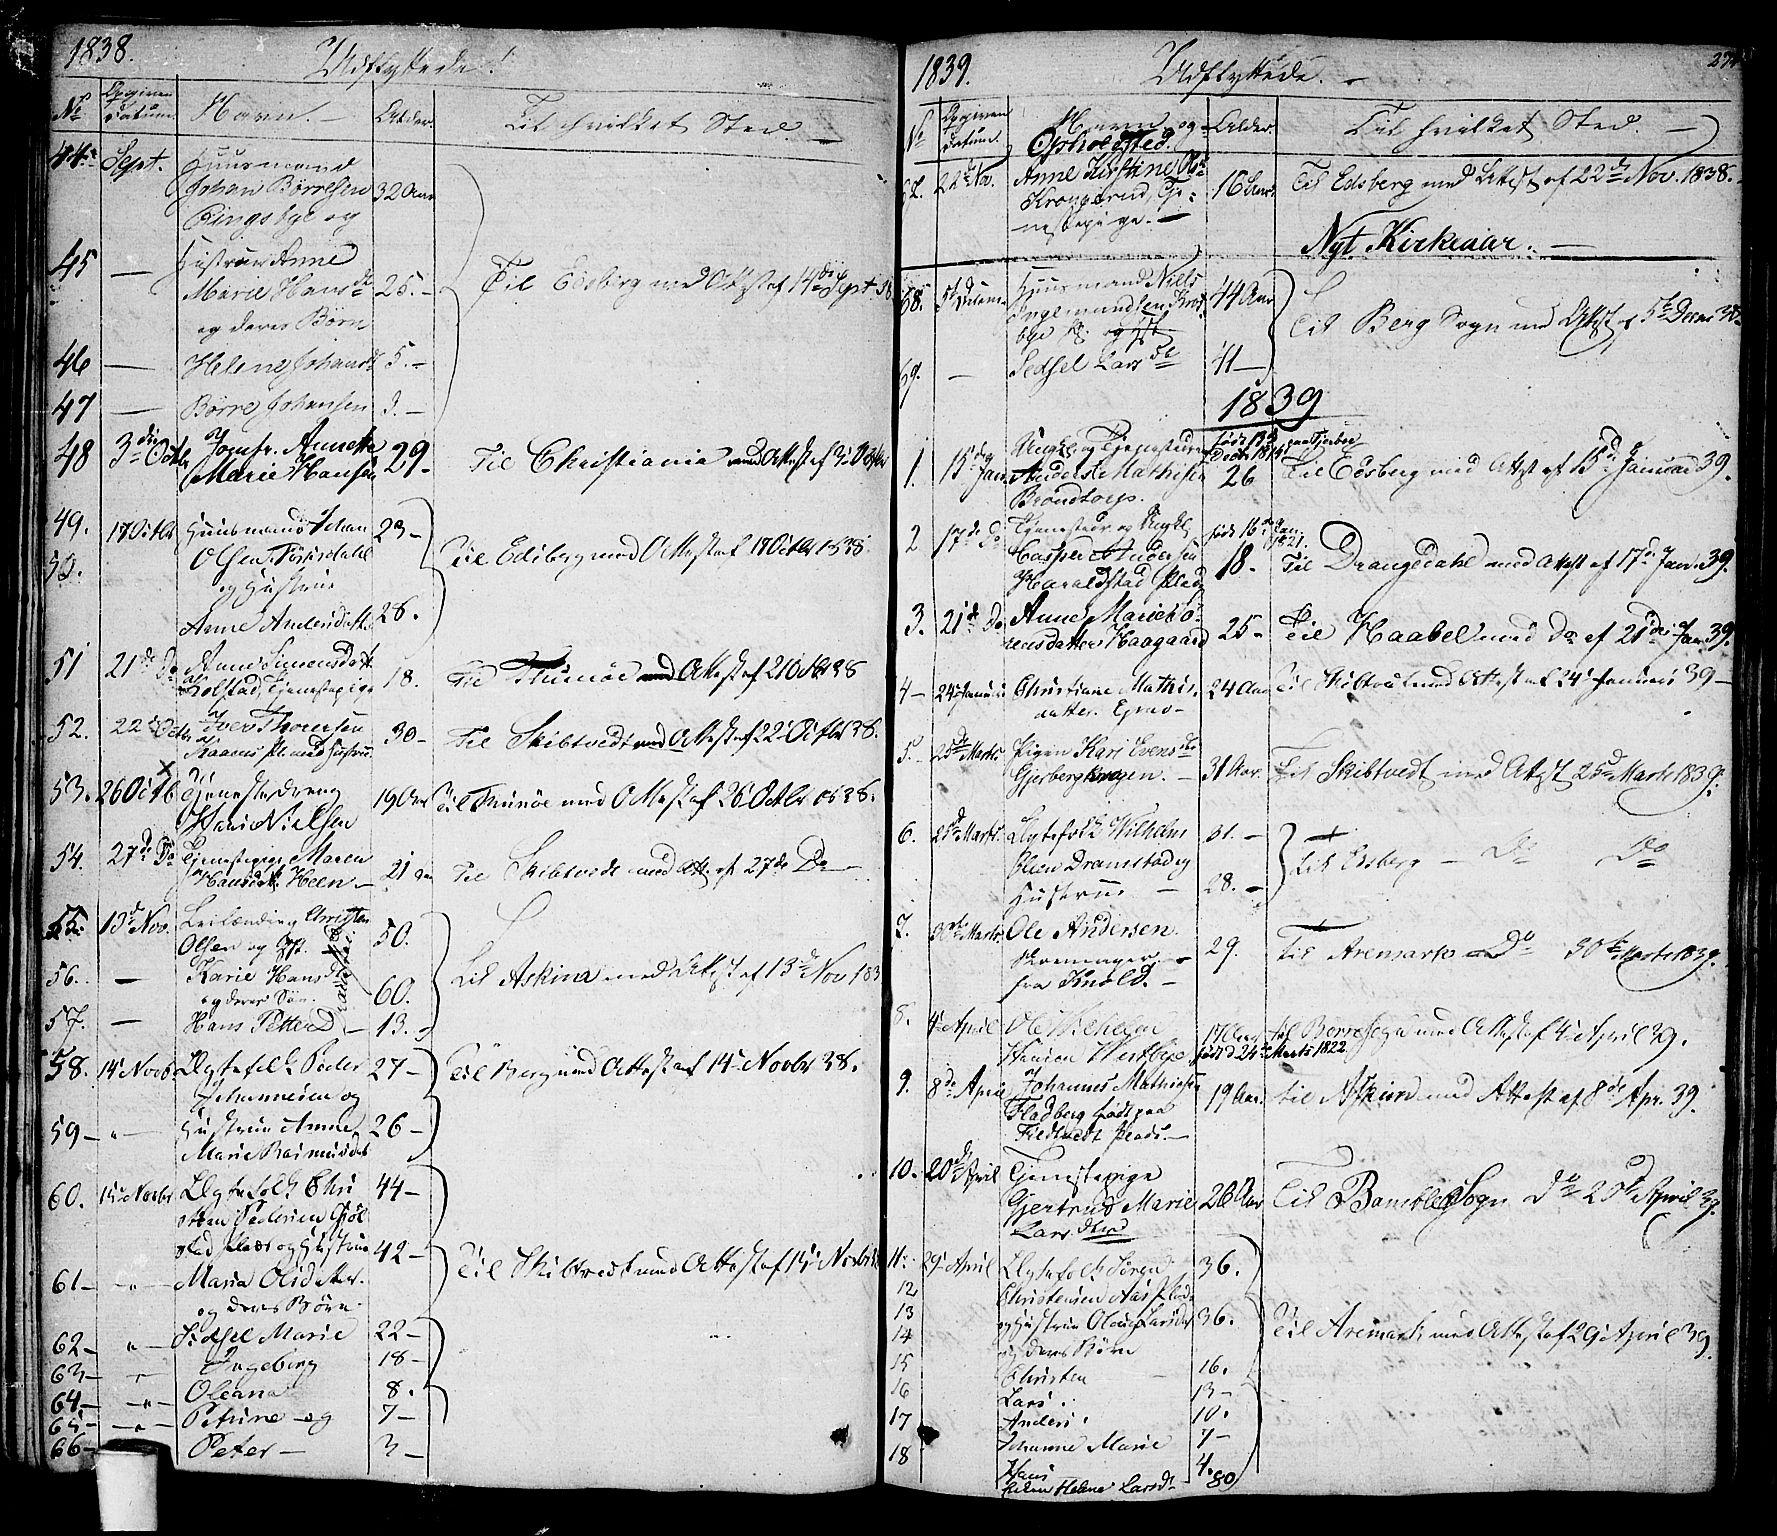 SAO, Rakkestad prestekontor Kirkebøker, F/Fa/L0007: Ministerialbok nr. I 7, 1825-1841, s. 274